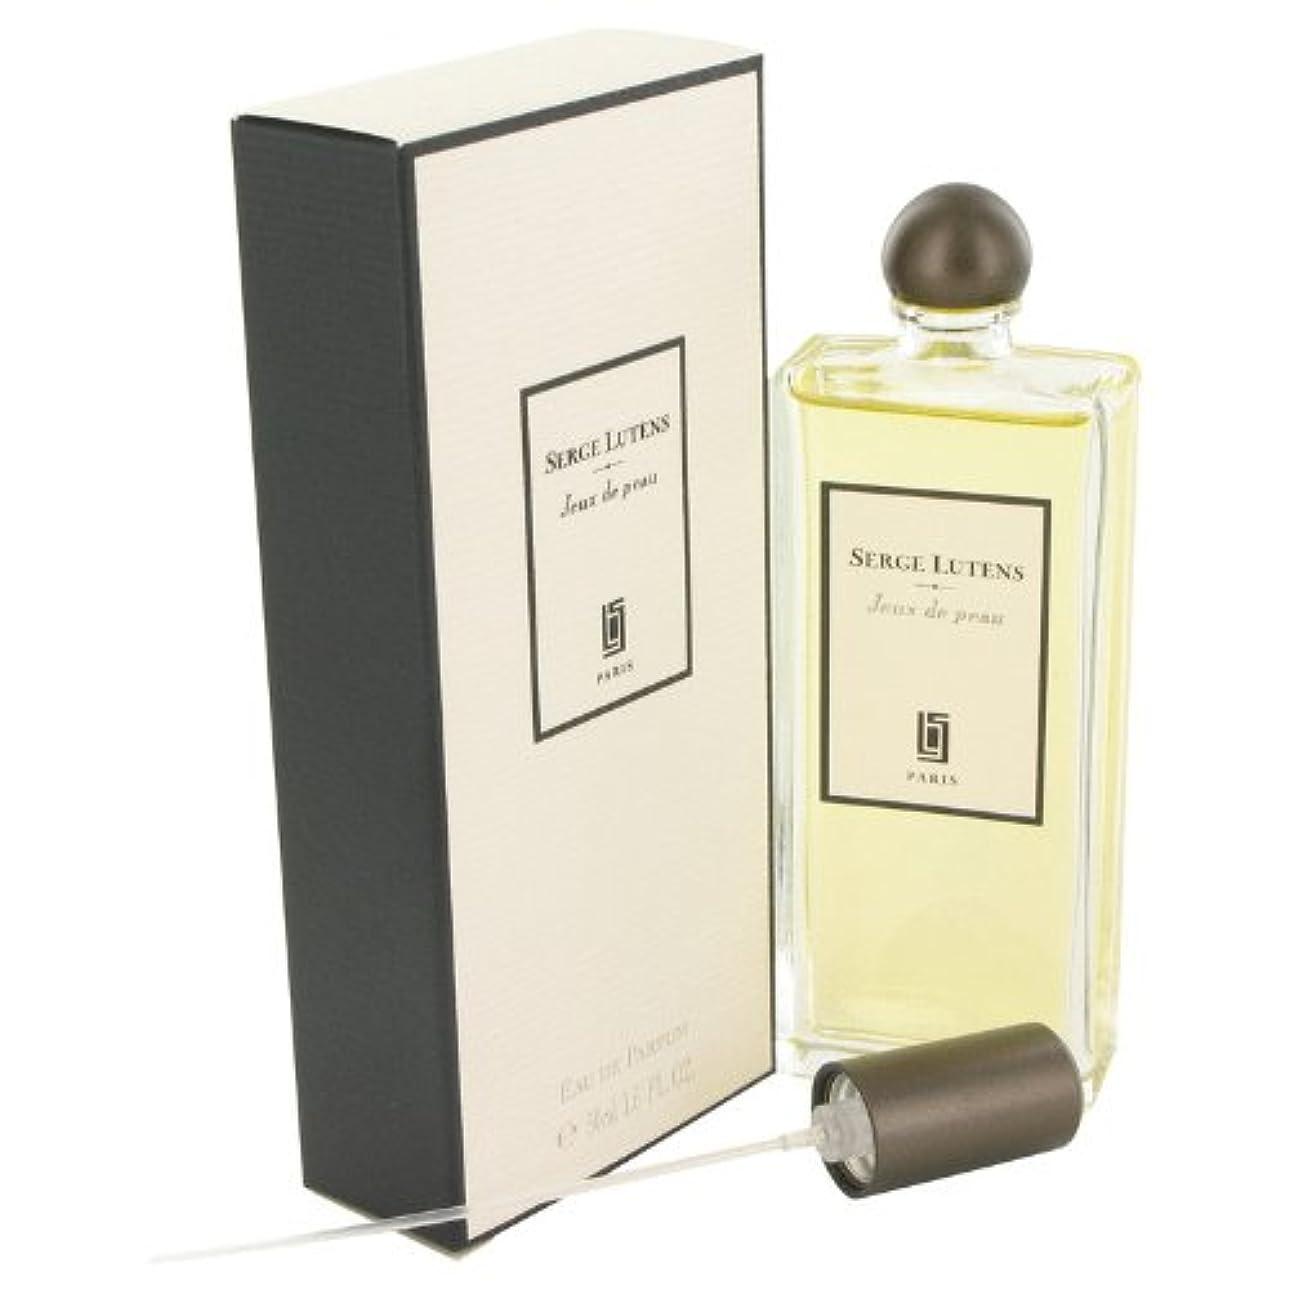 悪夢ニュース省略Jeux De Peau Eau De Parfum Spray (unisex) By Serge Lutens